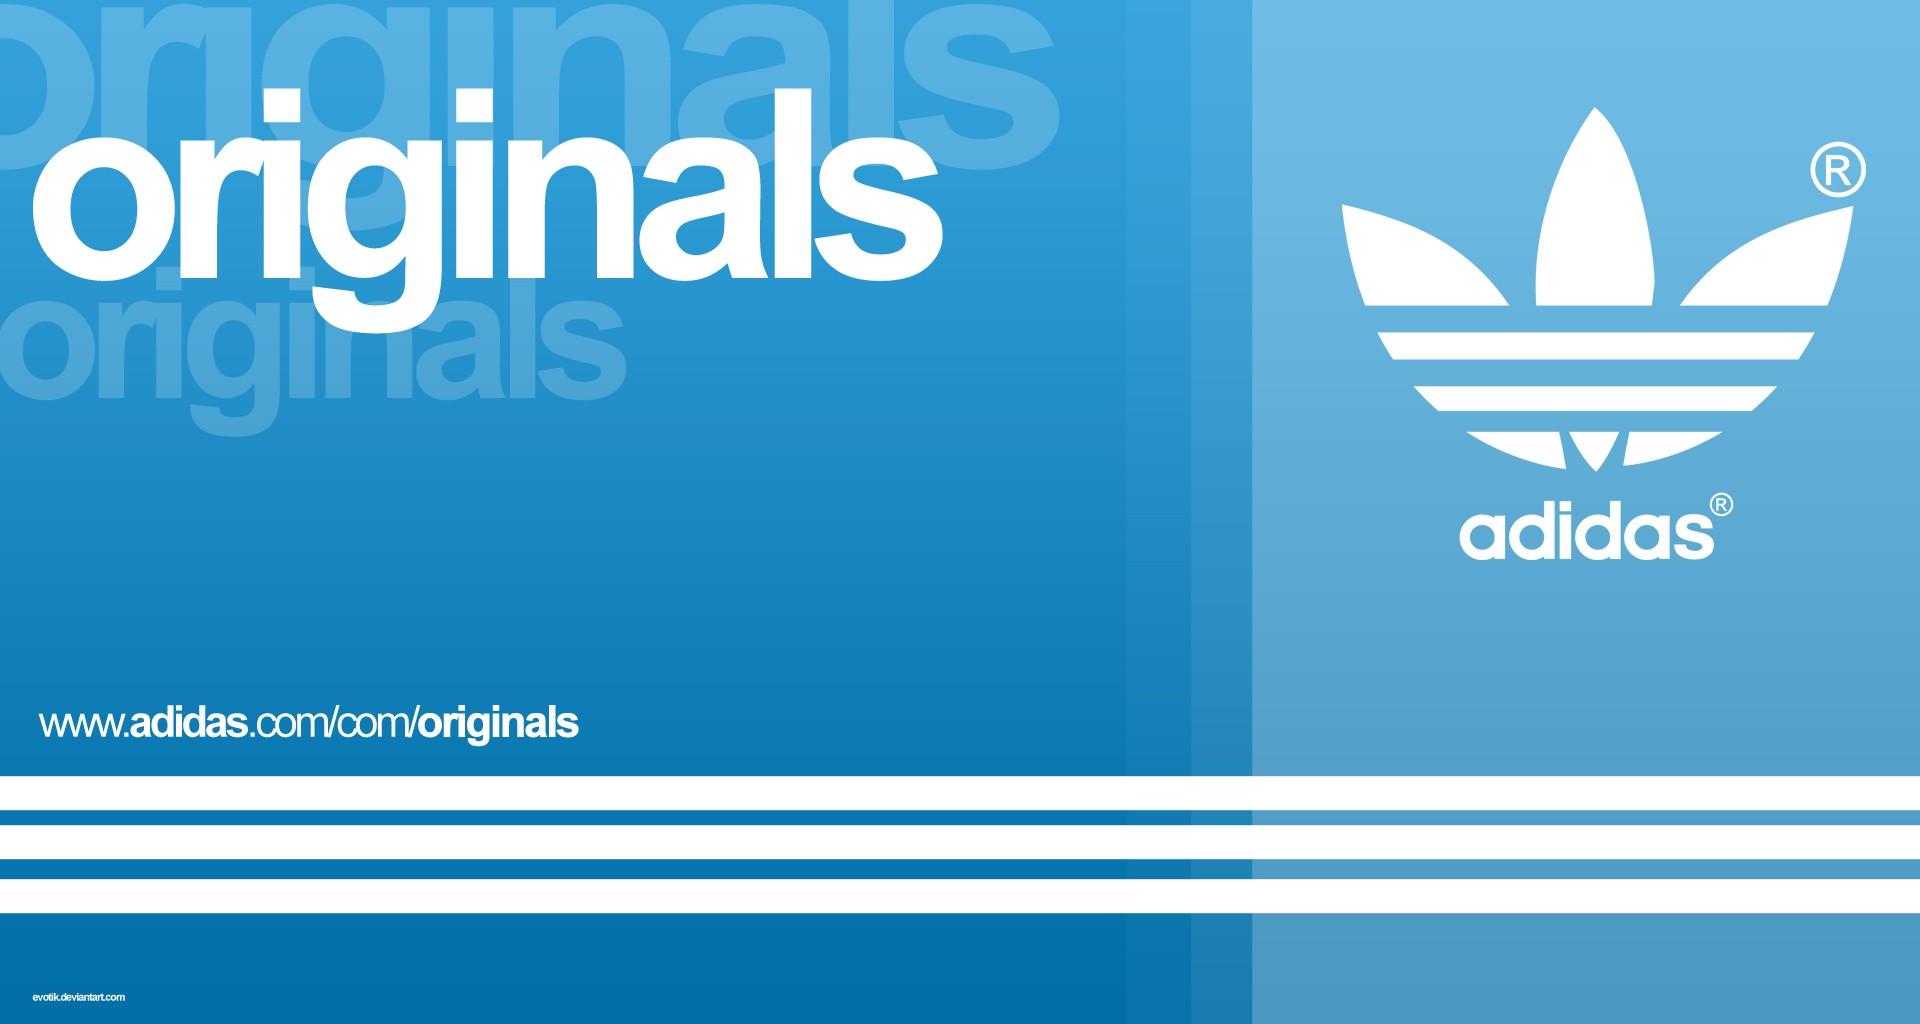 Pino Más programa  71+] Adidas Originals Wallpaper on WallpaperSafari